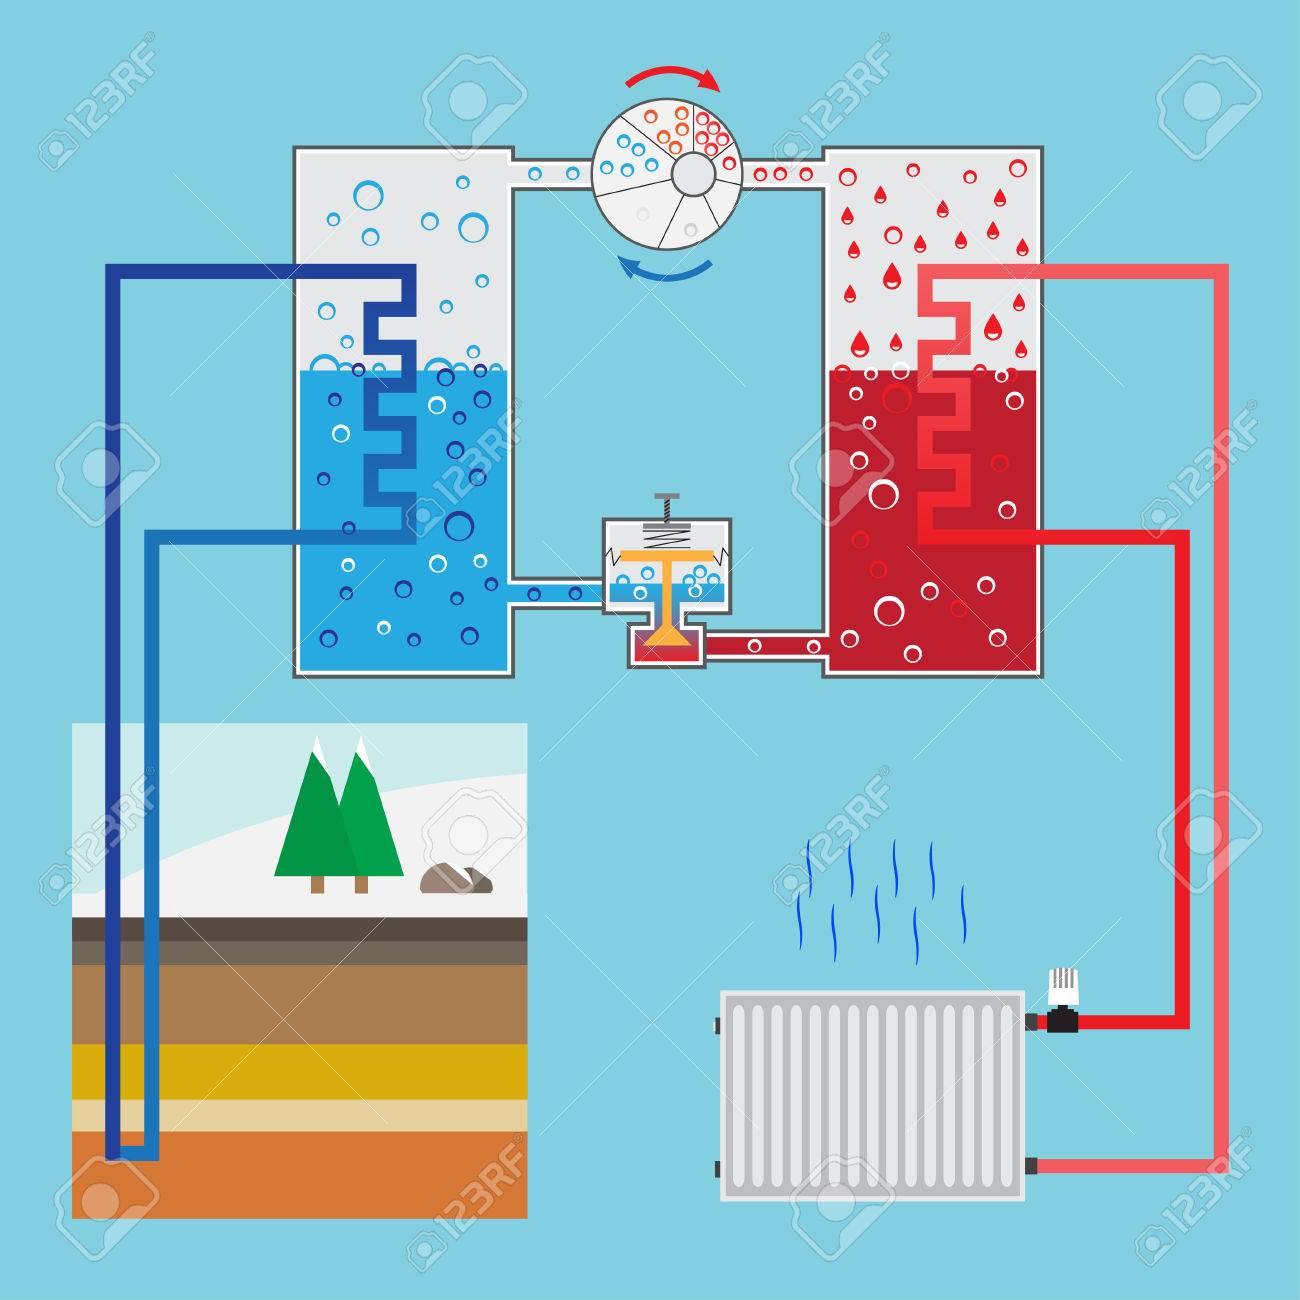 hight resolution of energy saving heating pump system scheme heating pump green energy geothermal heating